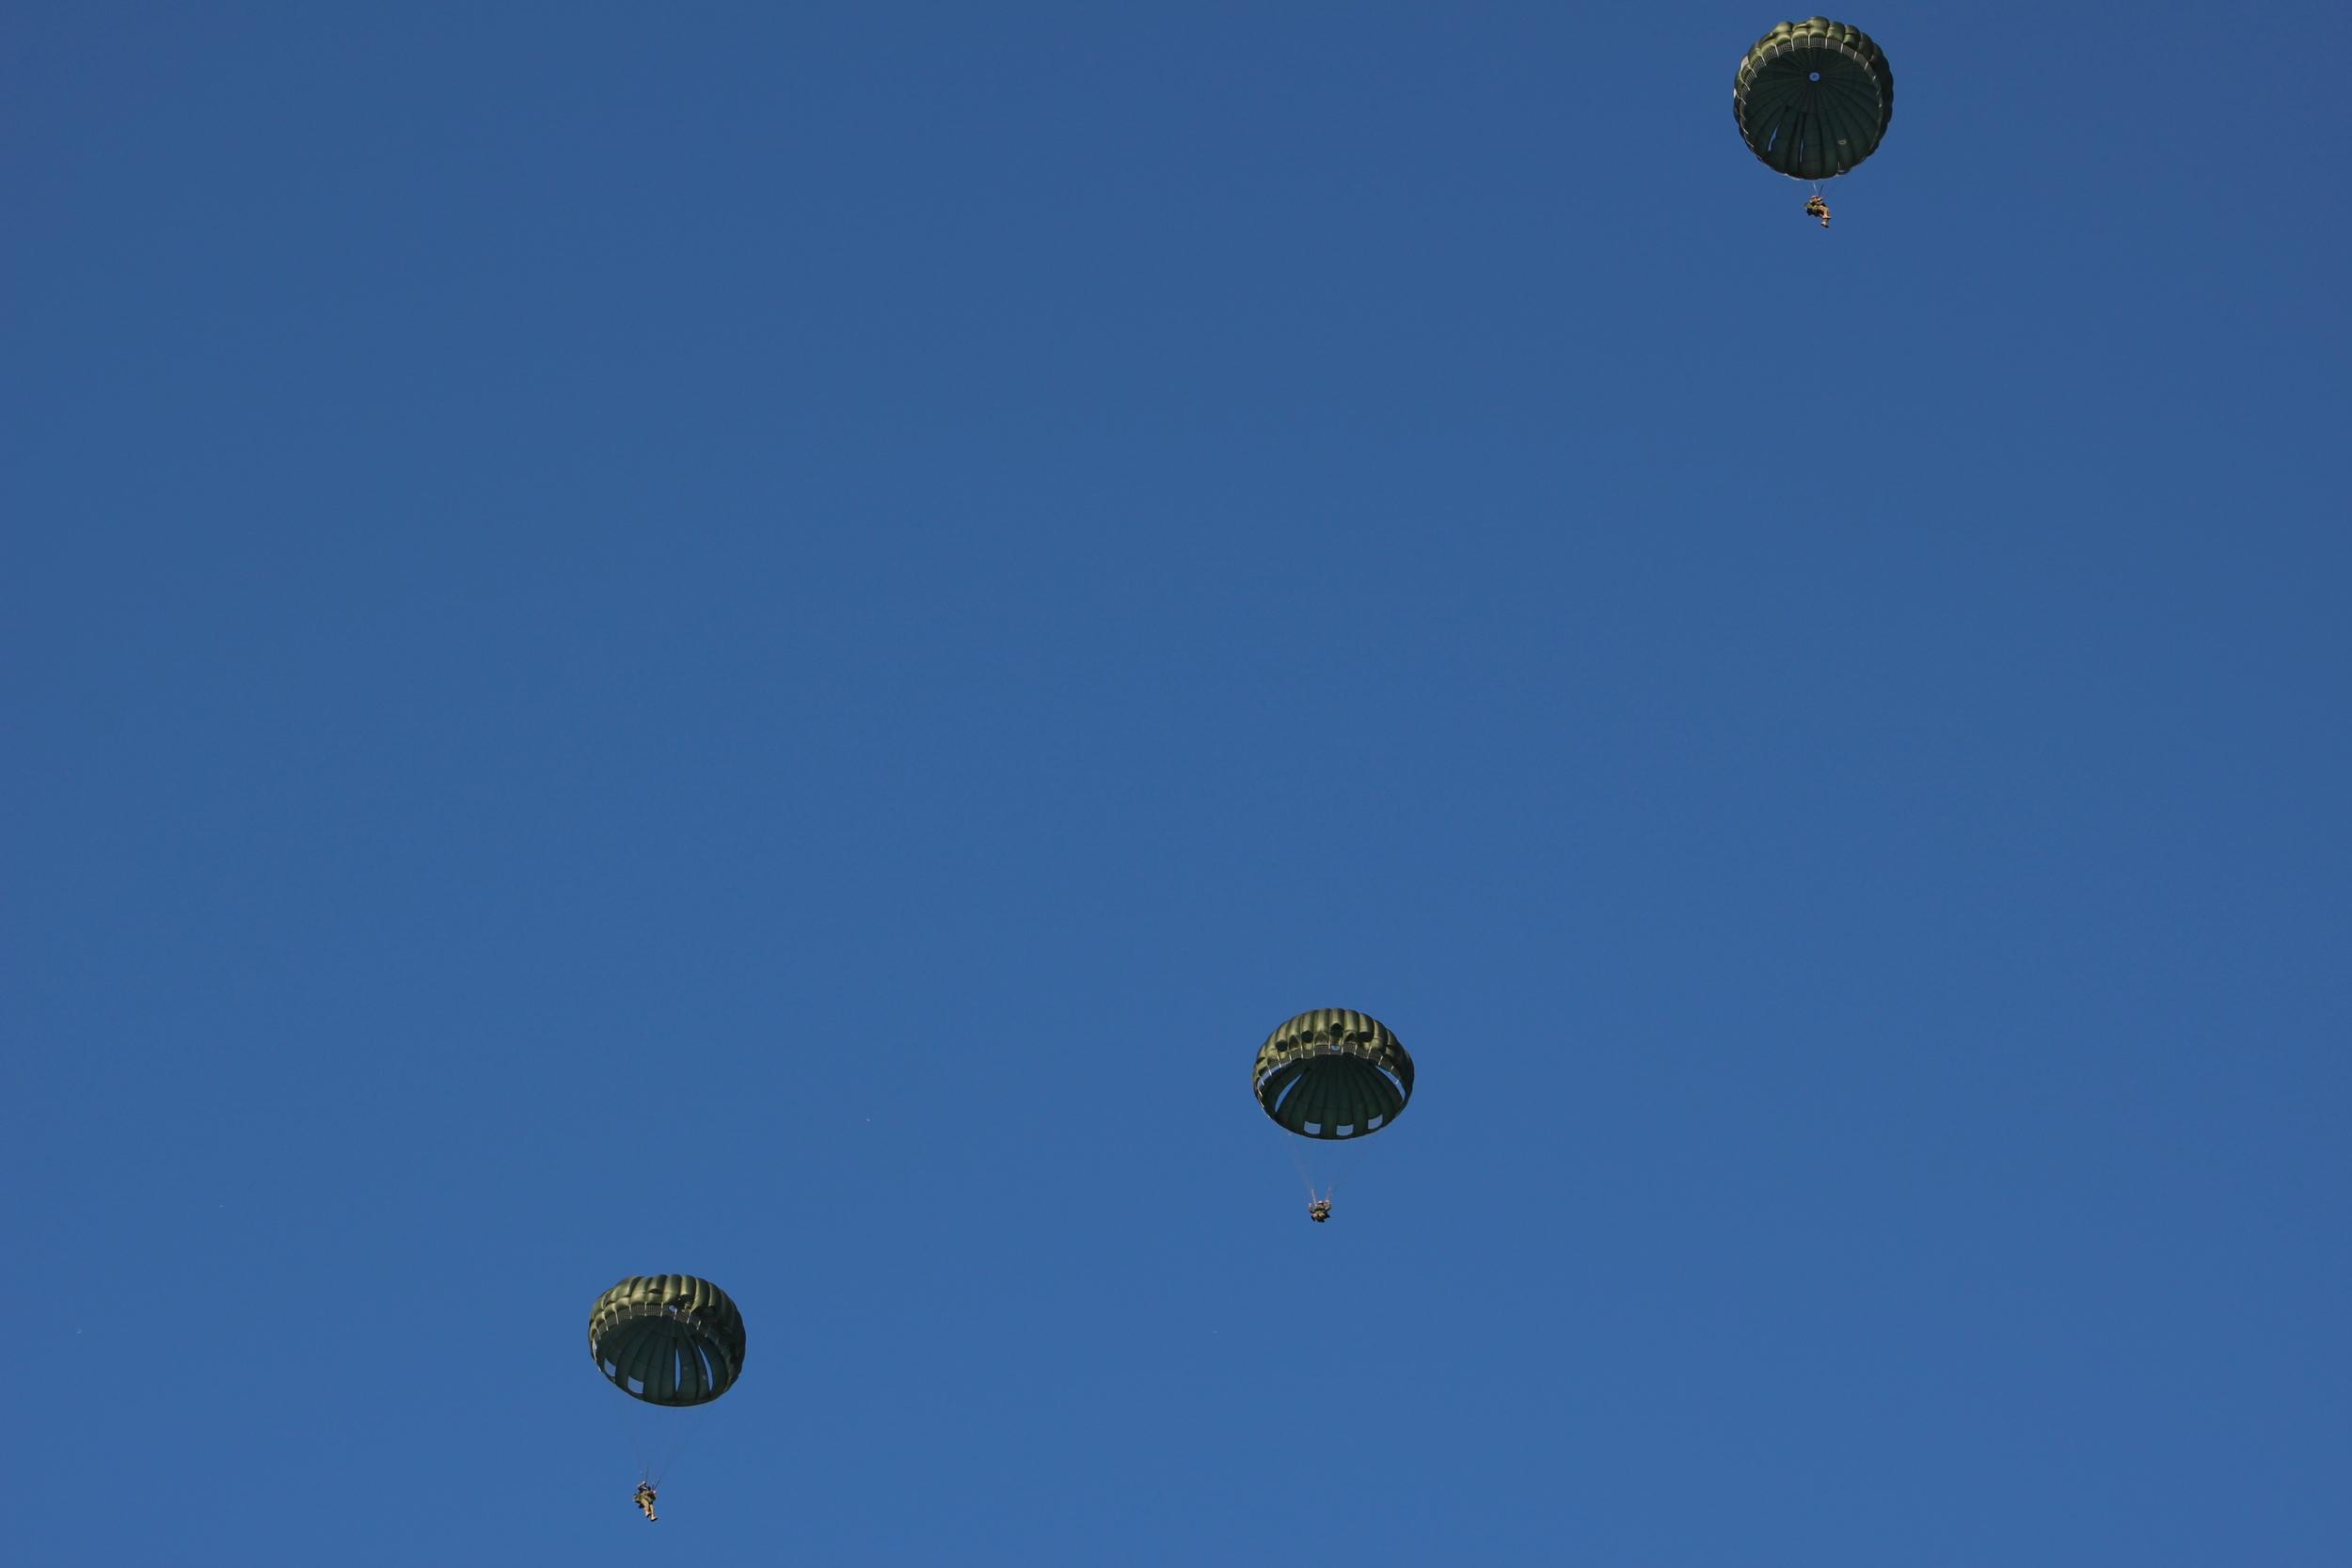 Lisa pics from jump event - 13feb16 (55).JPG